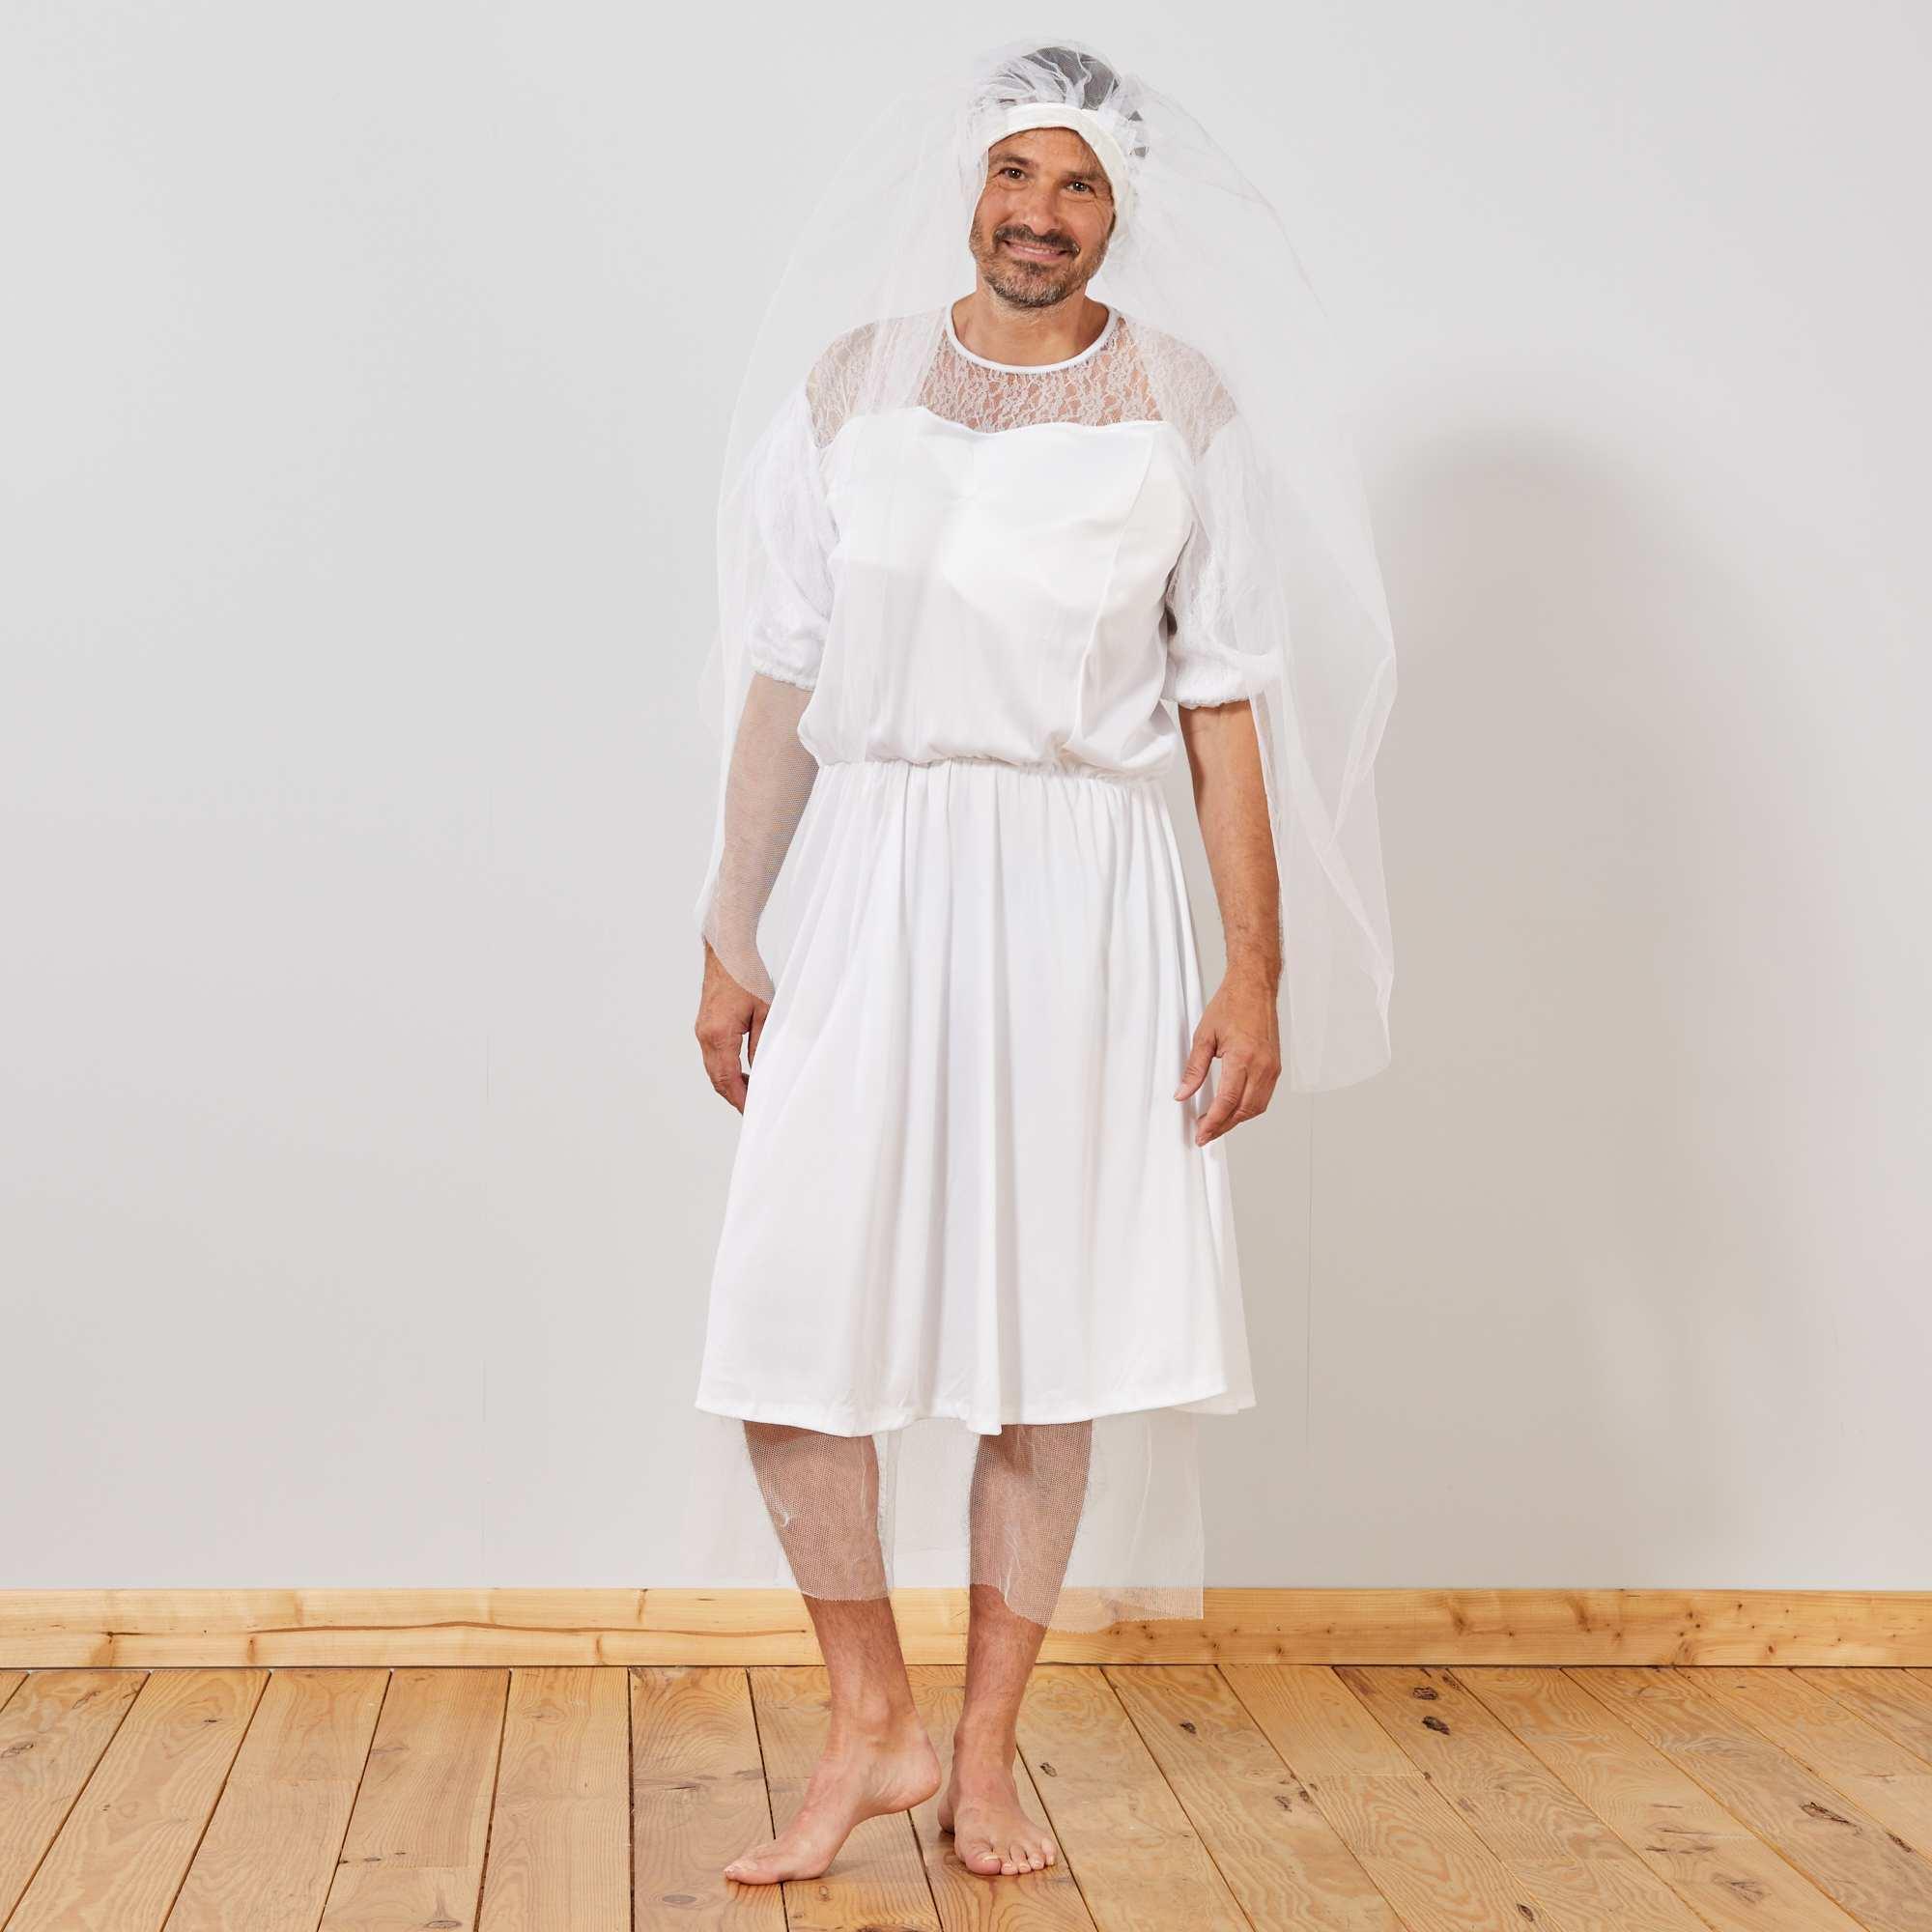 19d78a1203b homme en robe de mariee